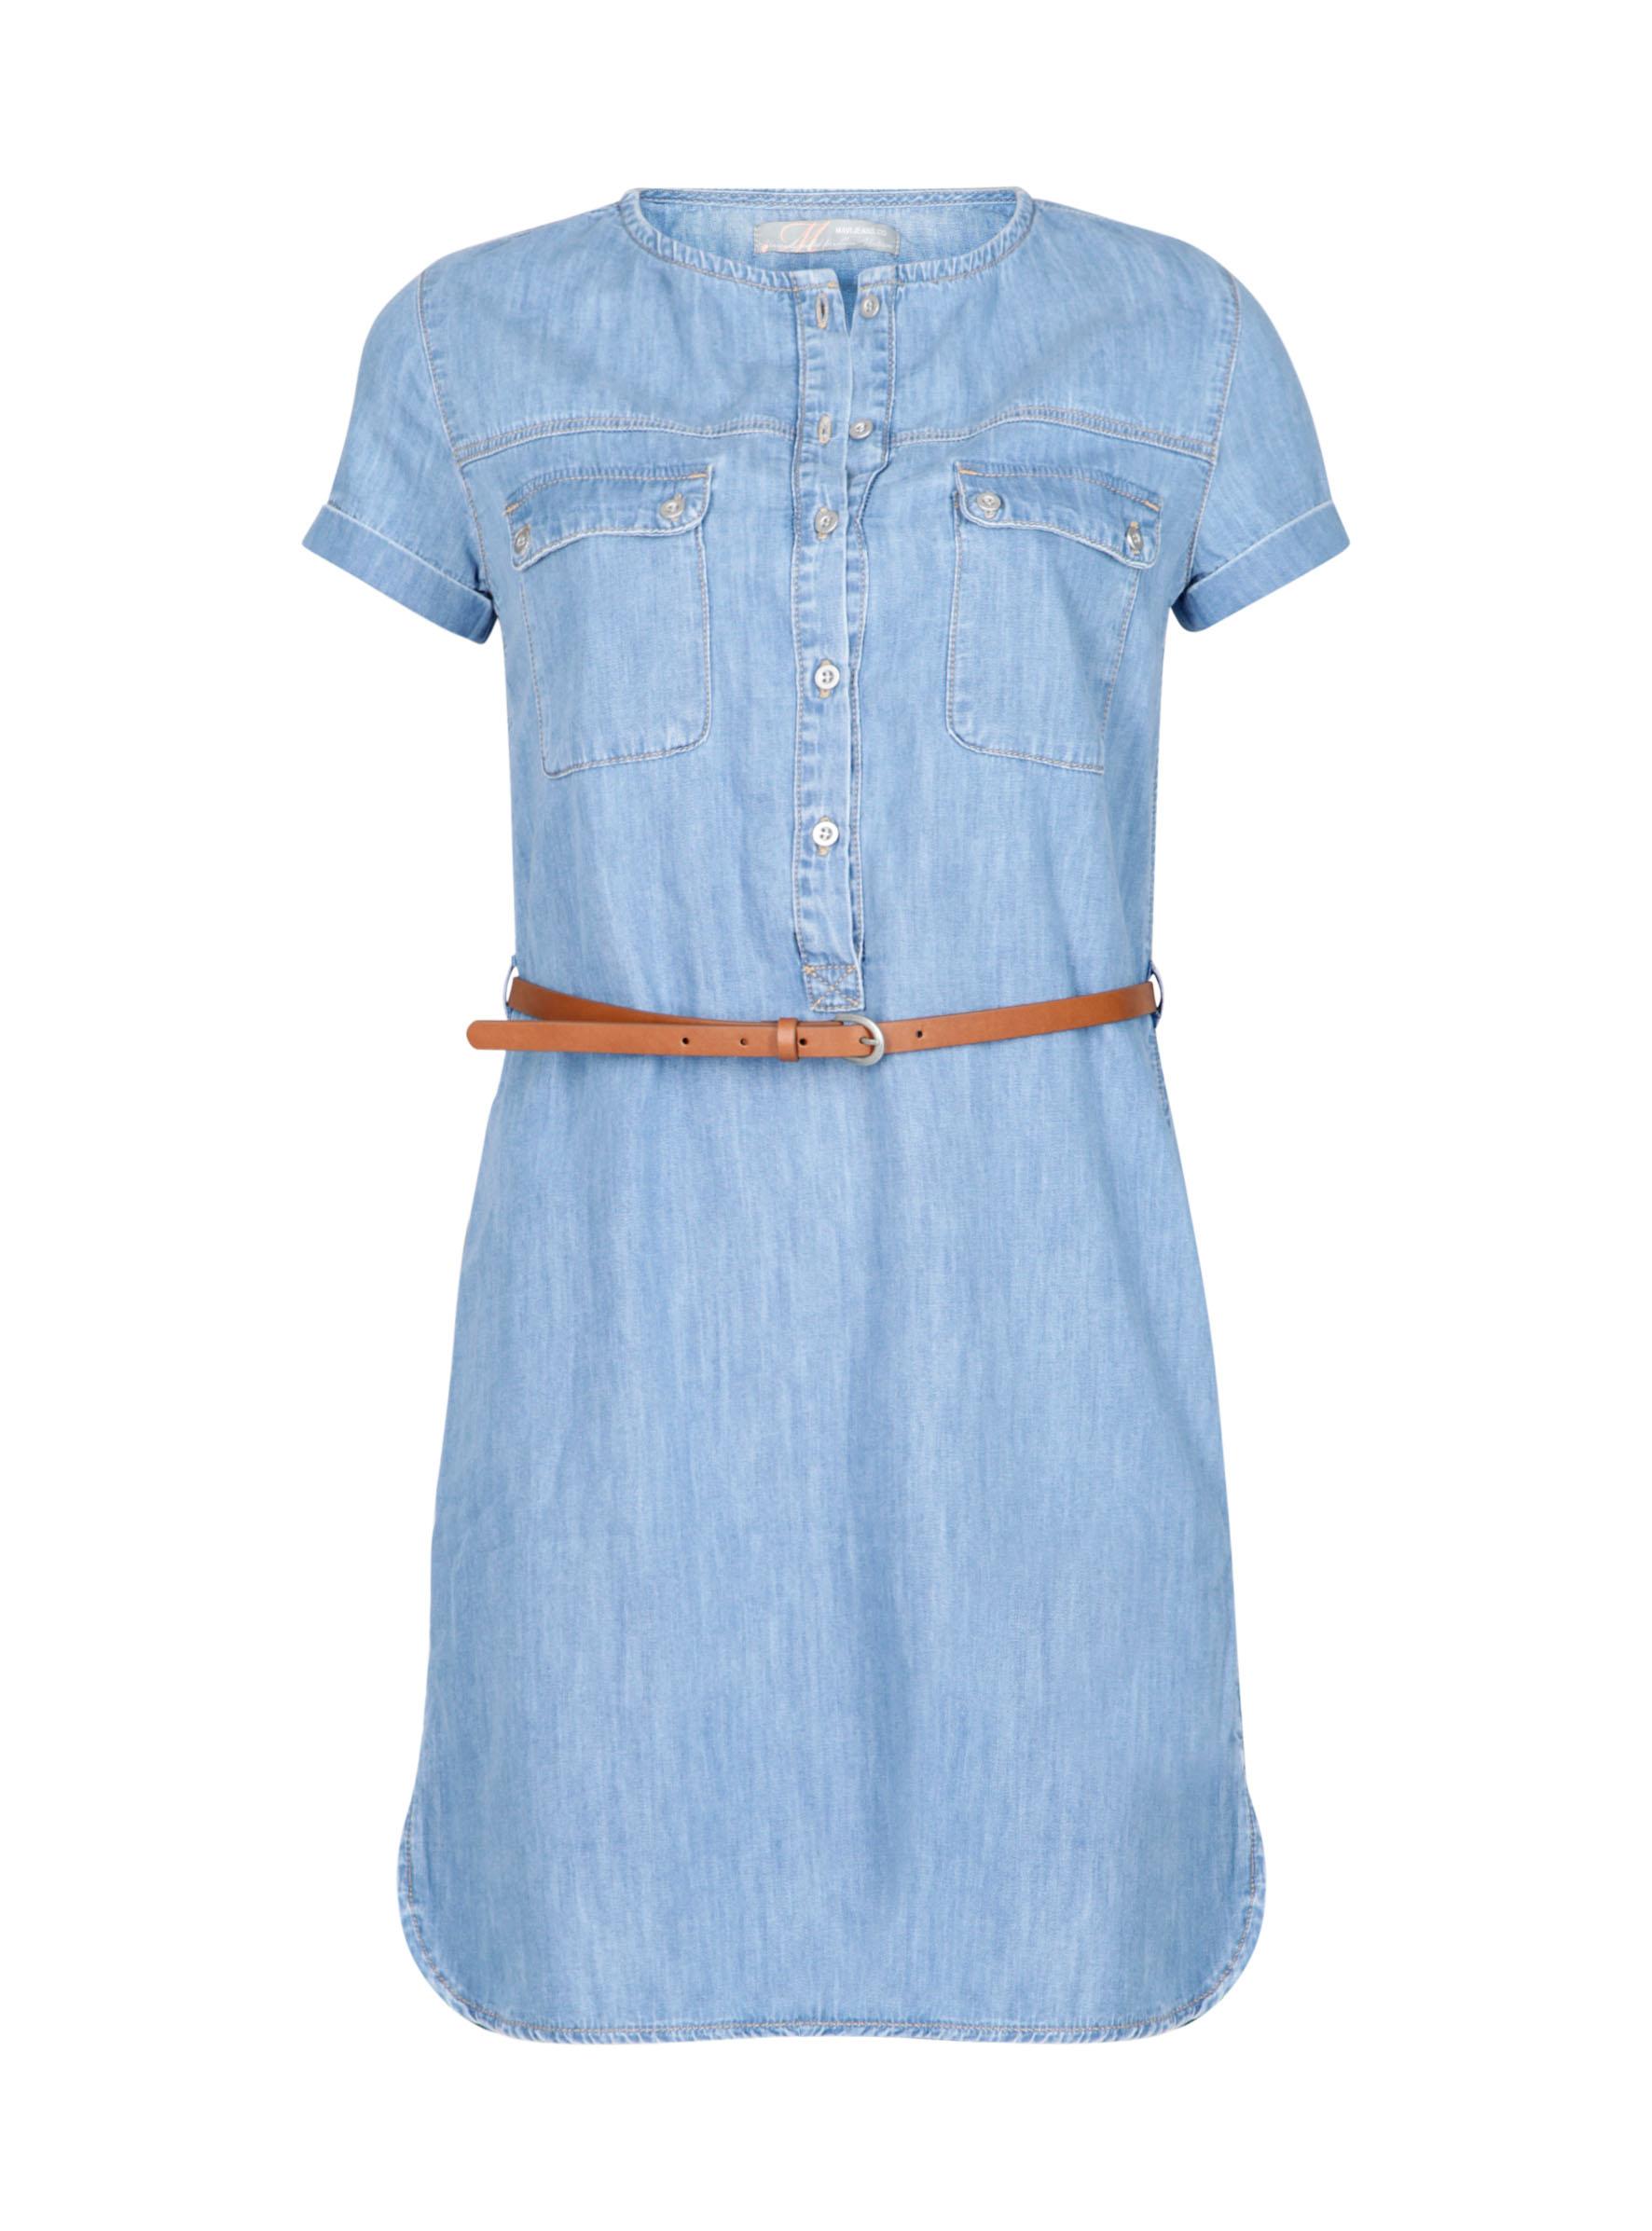 Baumwollkleid in Denim Look in er Mavi Jeans Kollektion